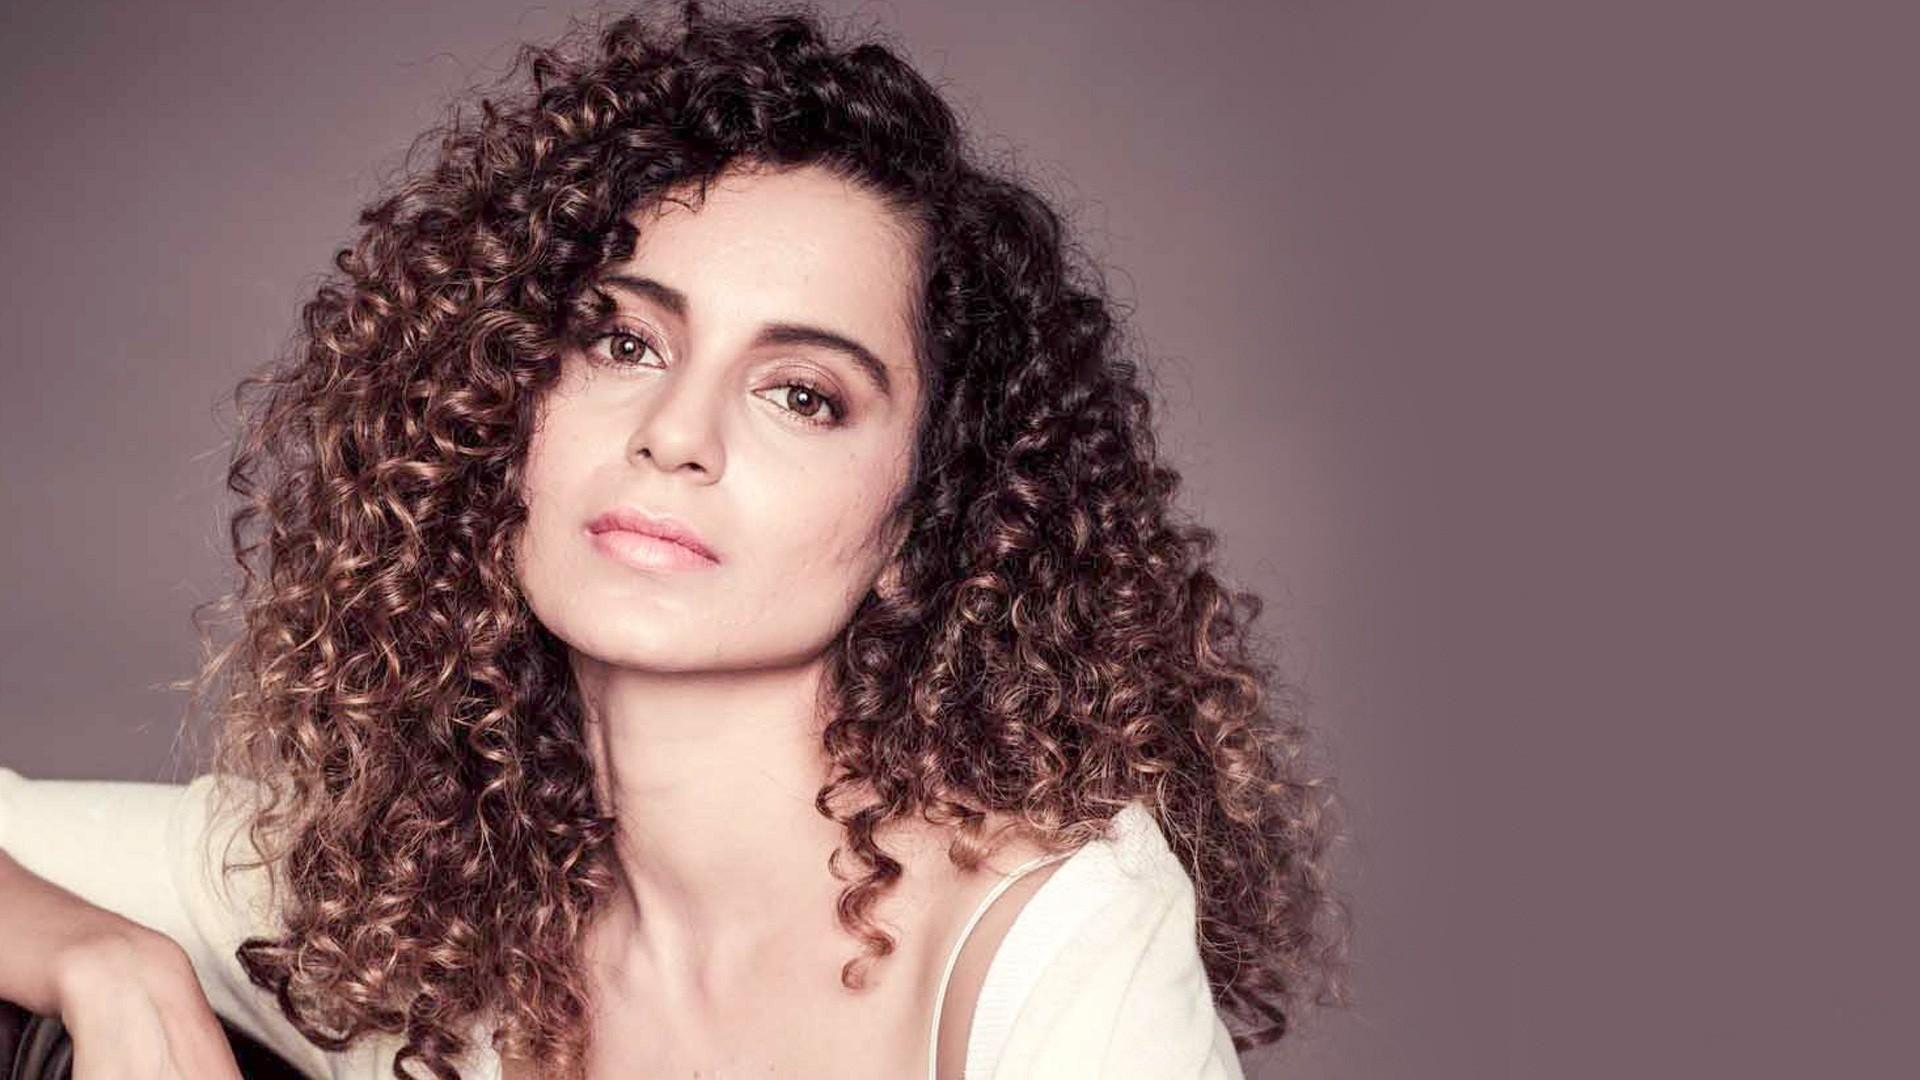 Kangana Ranaut Curly Hair 2016 Hair Care Tips Curly Hair Styles Hair Styles 2016